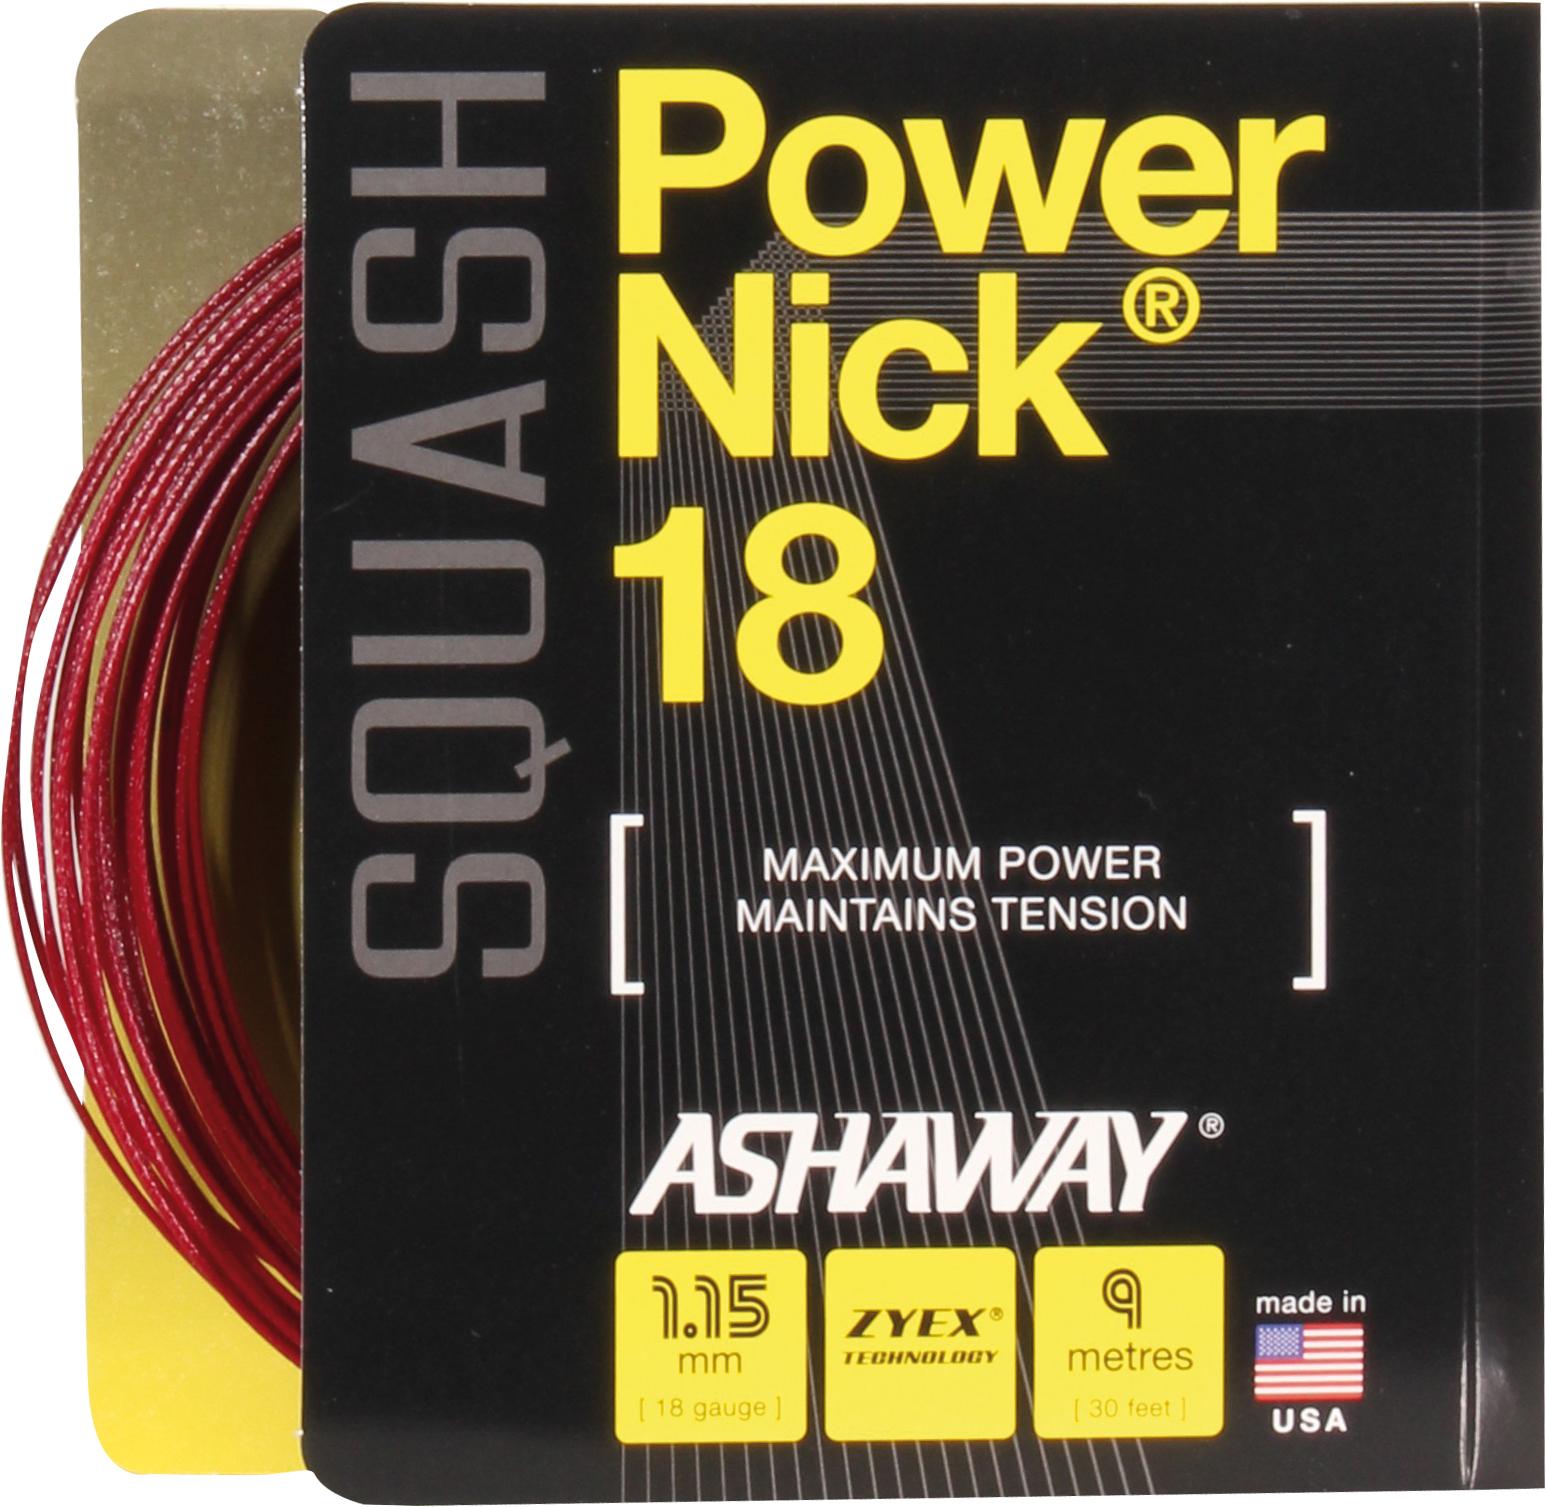 Ashaway PowerNick 18 Squash String NZ